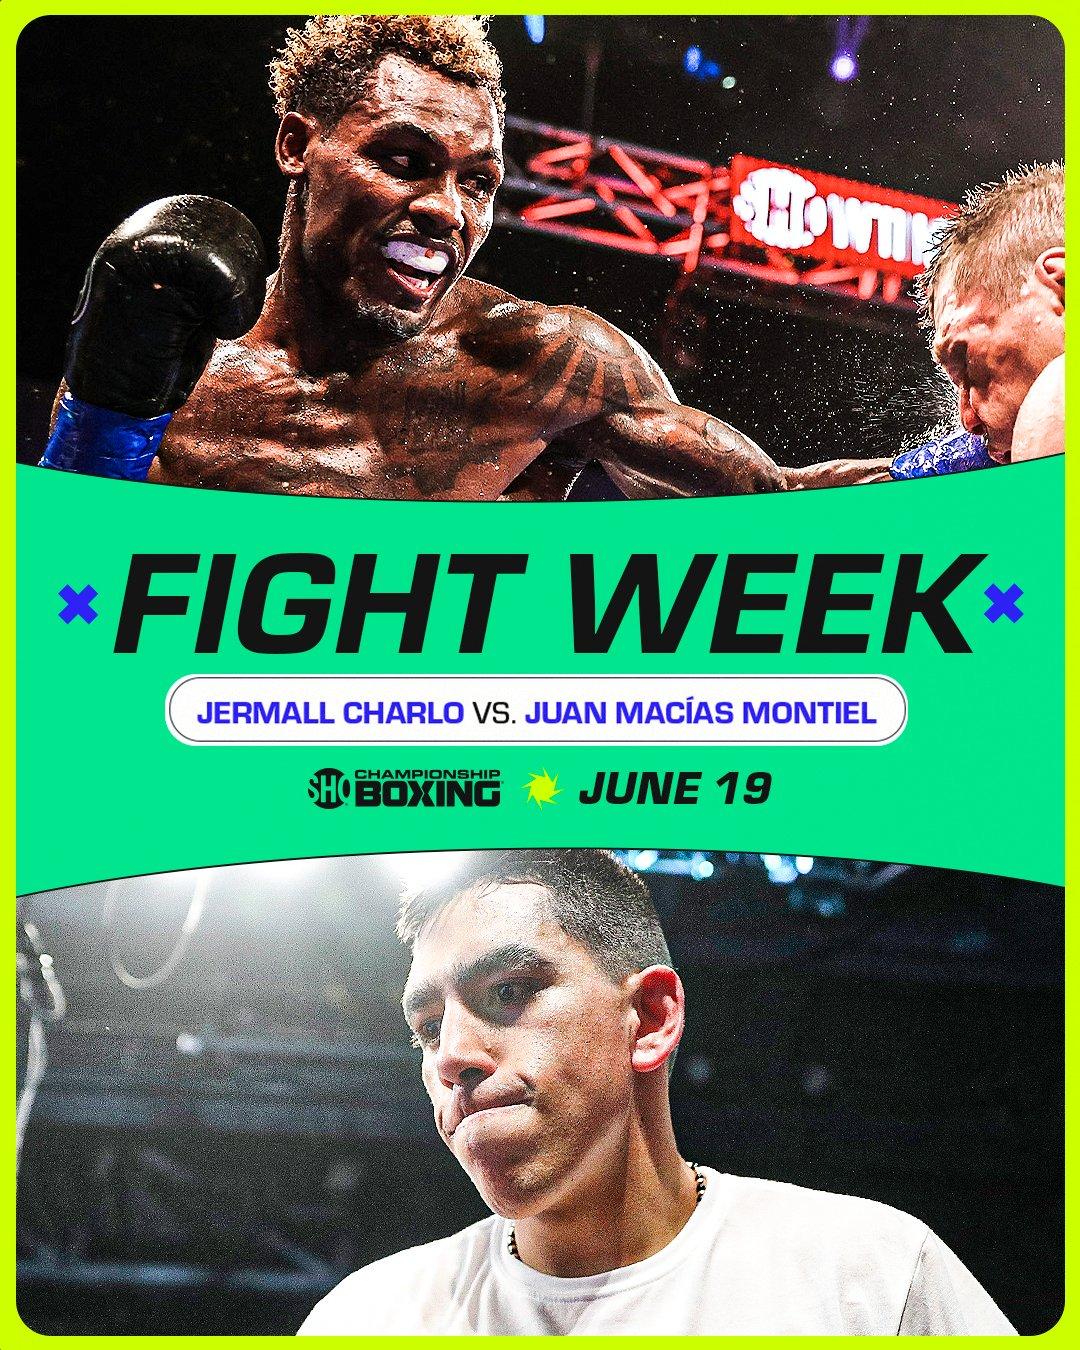 Jermall Charlo vs. Juan Macías Montiel this Saturday June 19 | Boxen247.com